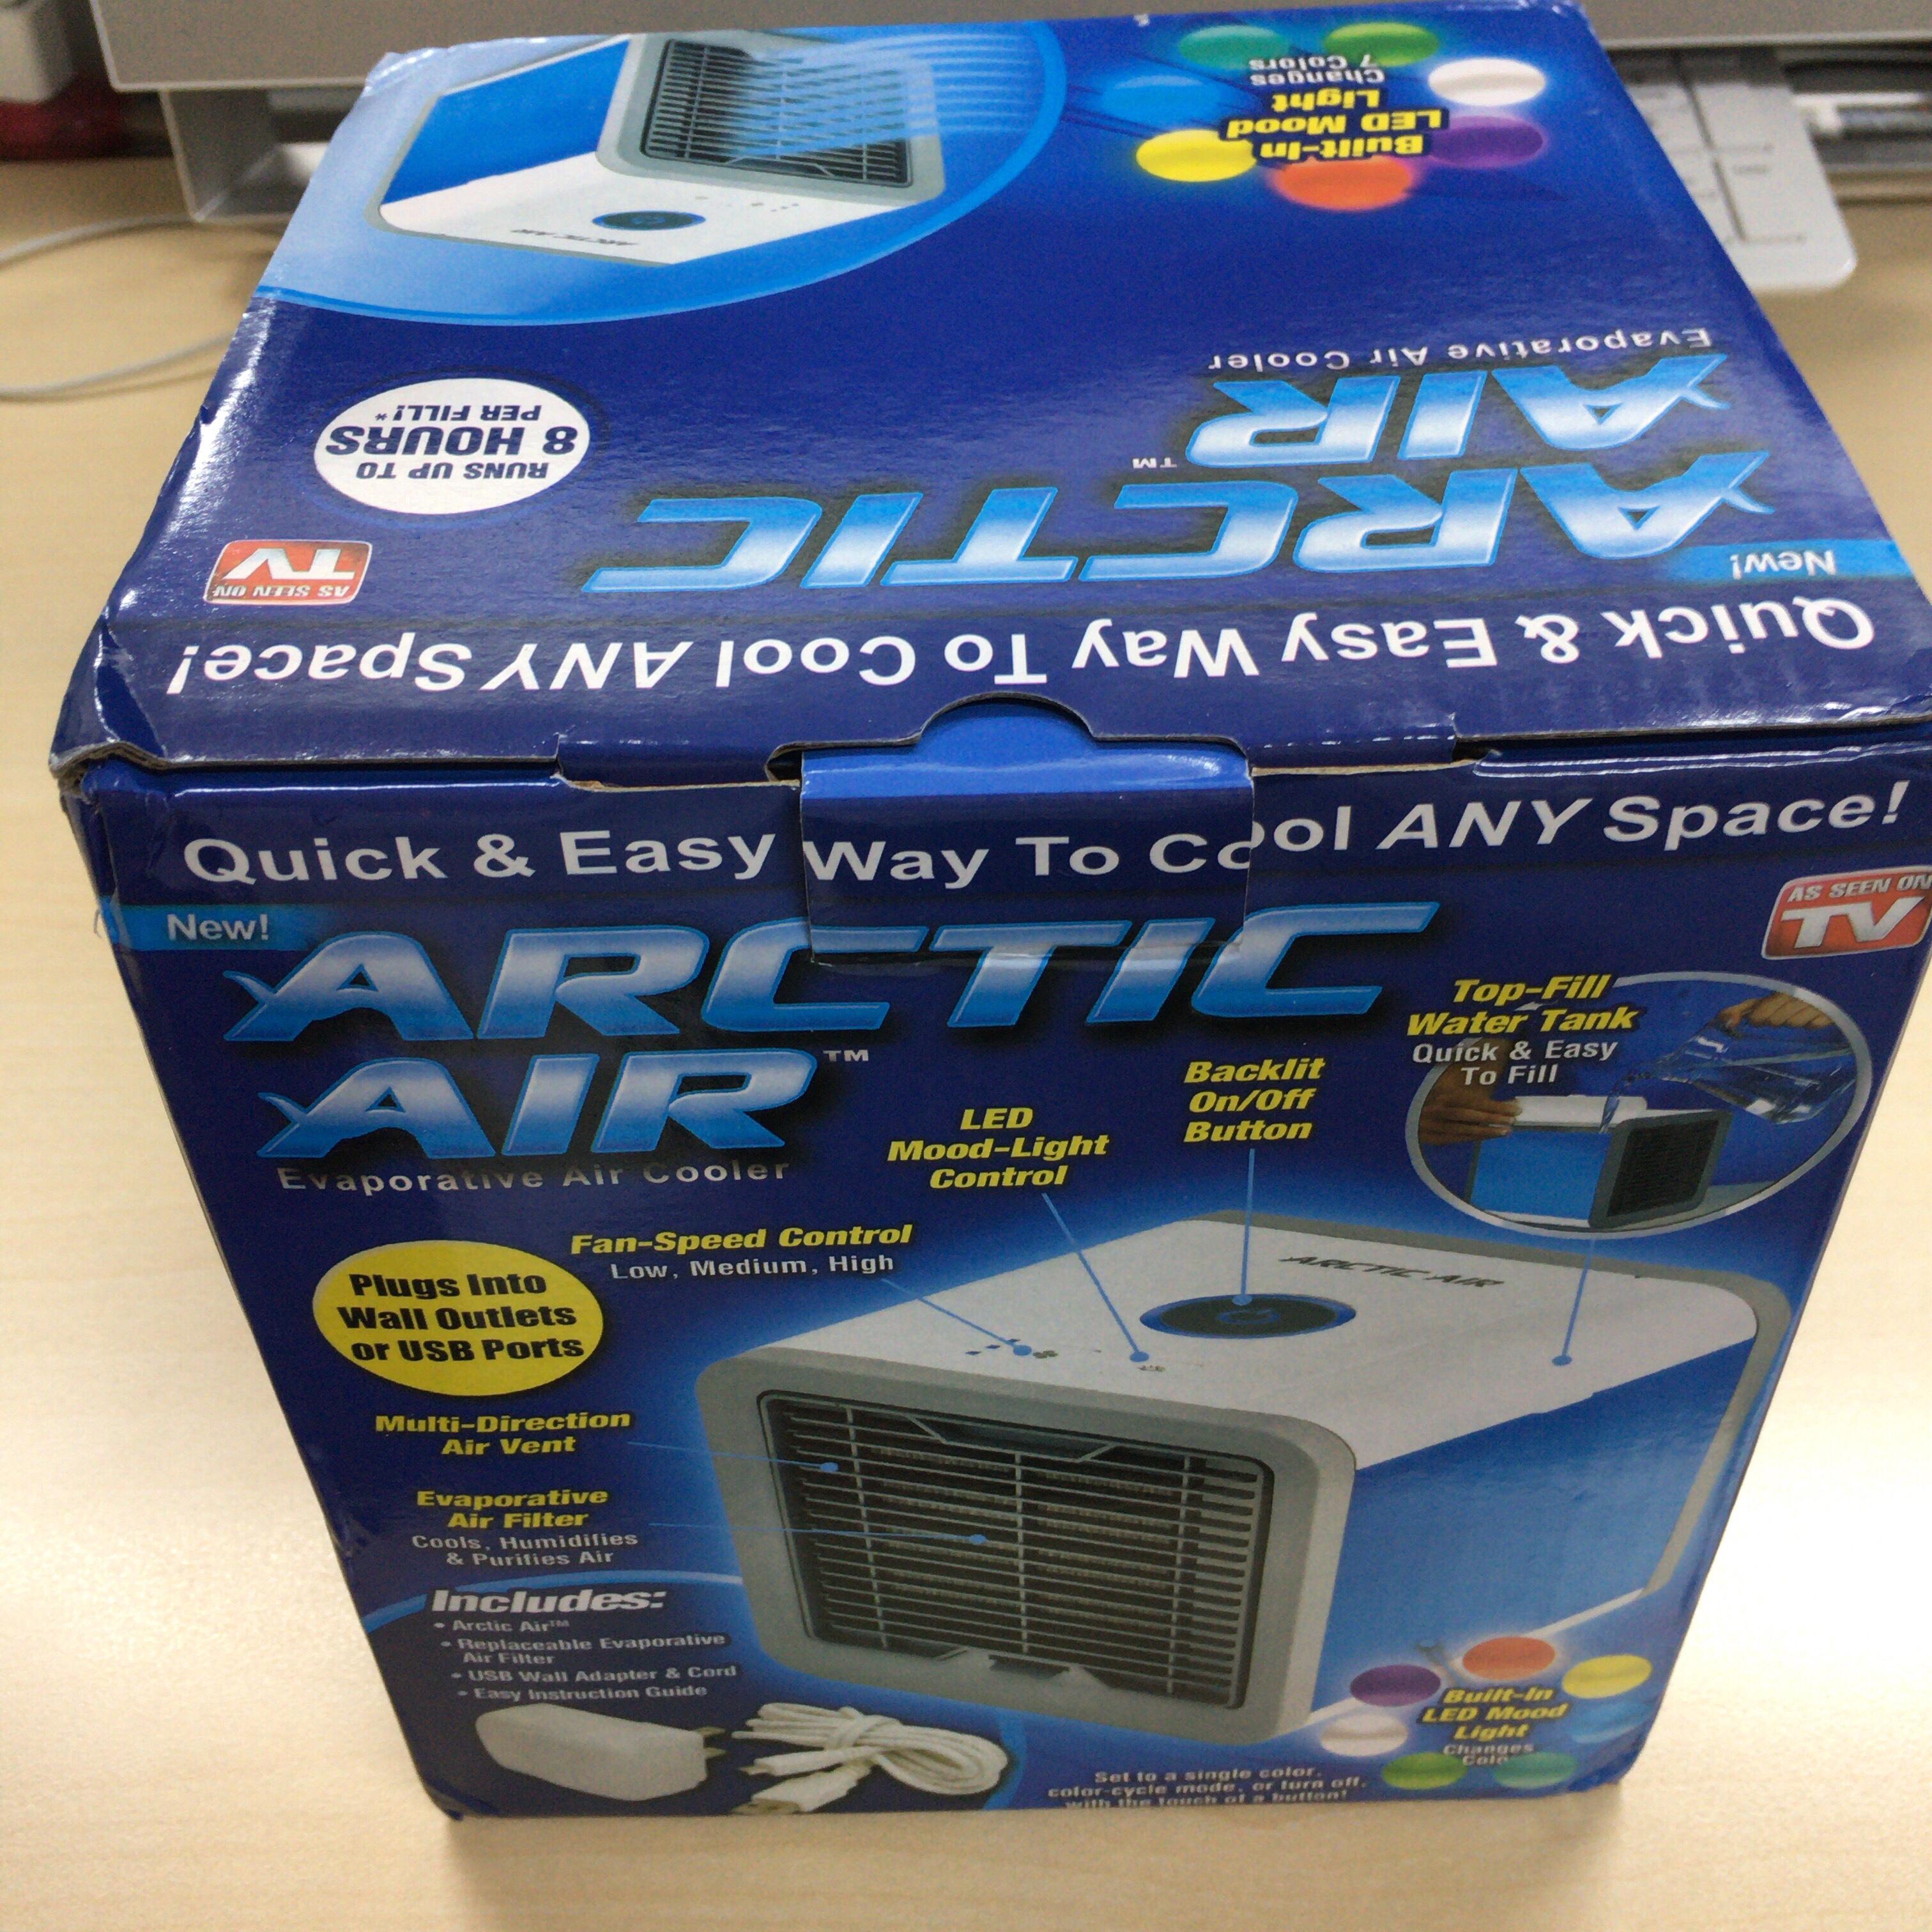 COMLIFE冷風機の外箱